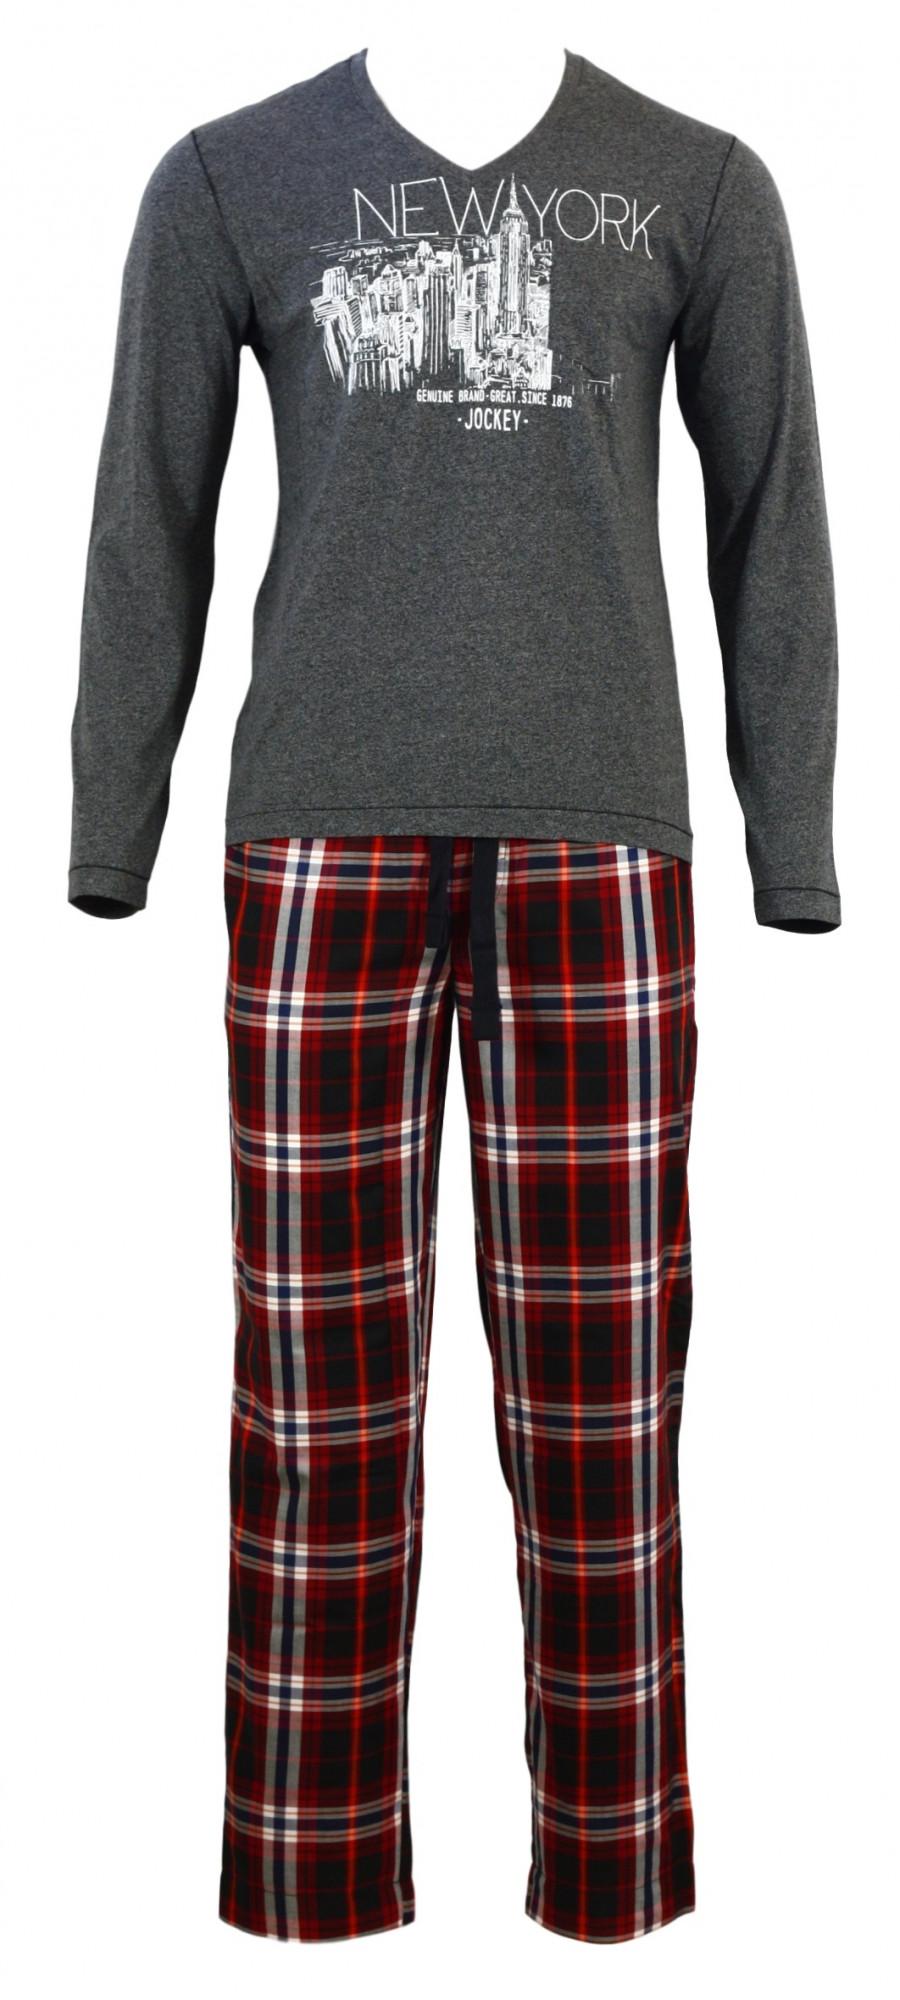 Pánské pyžamo 542002 - Jockey originál M